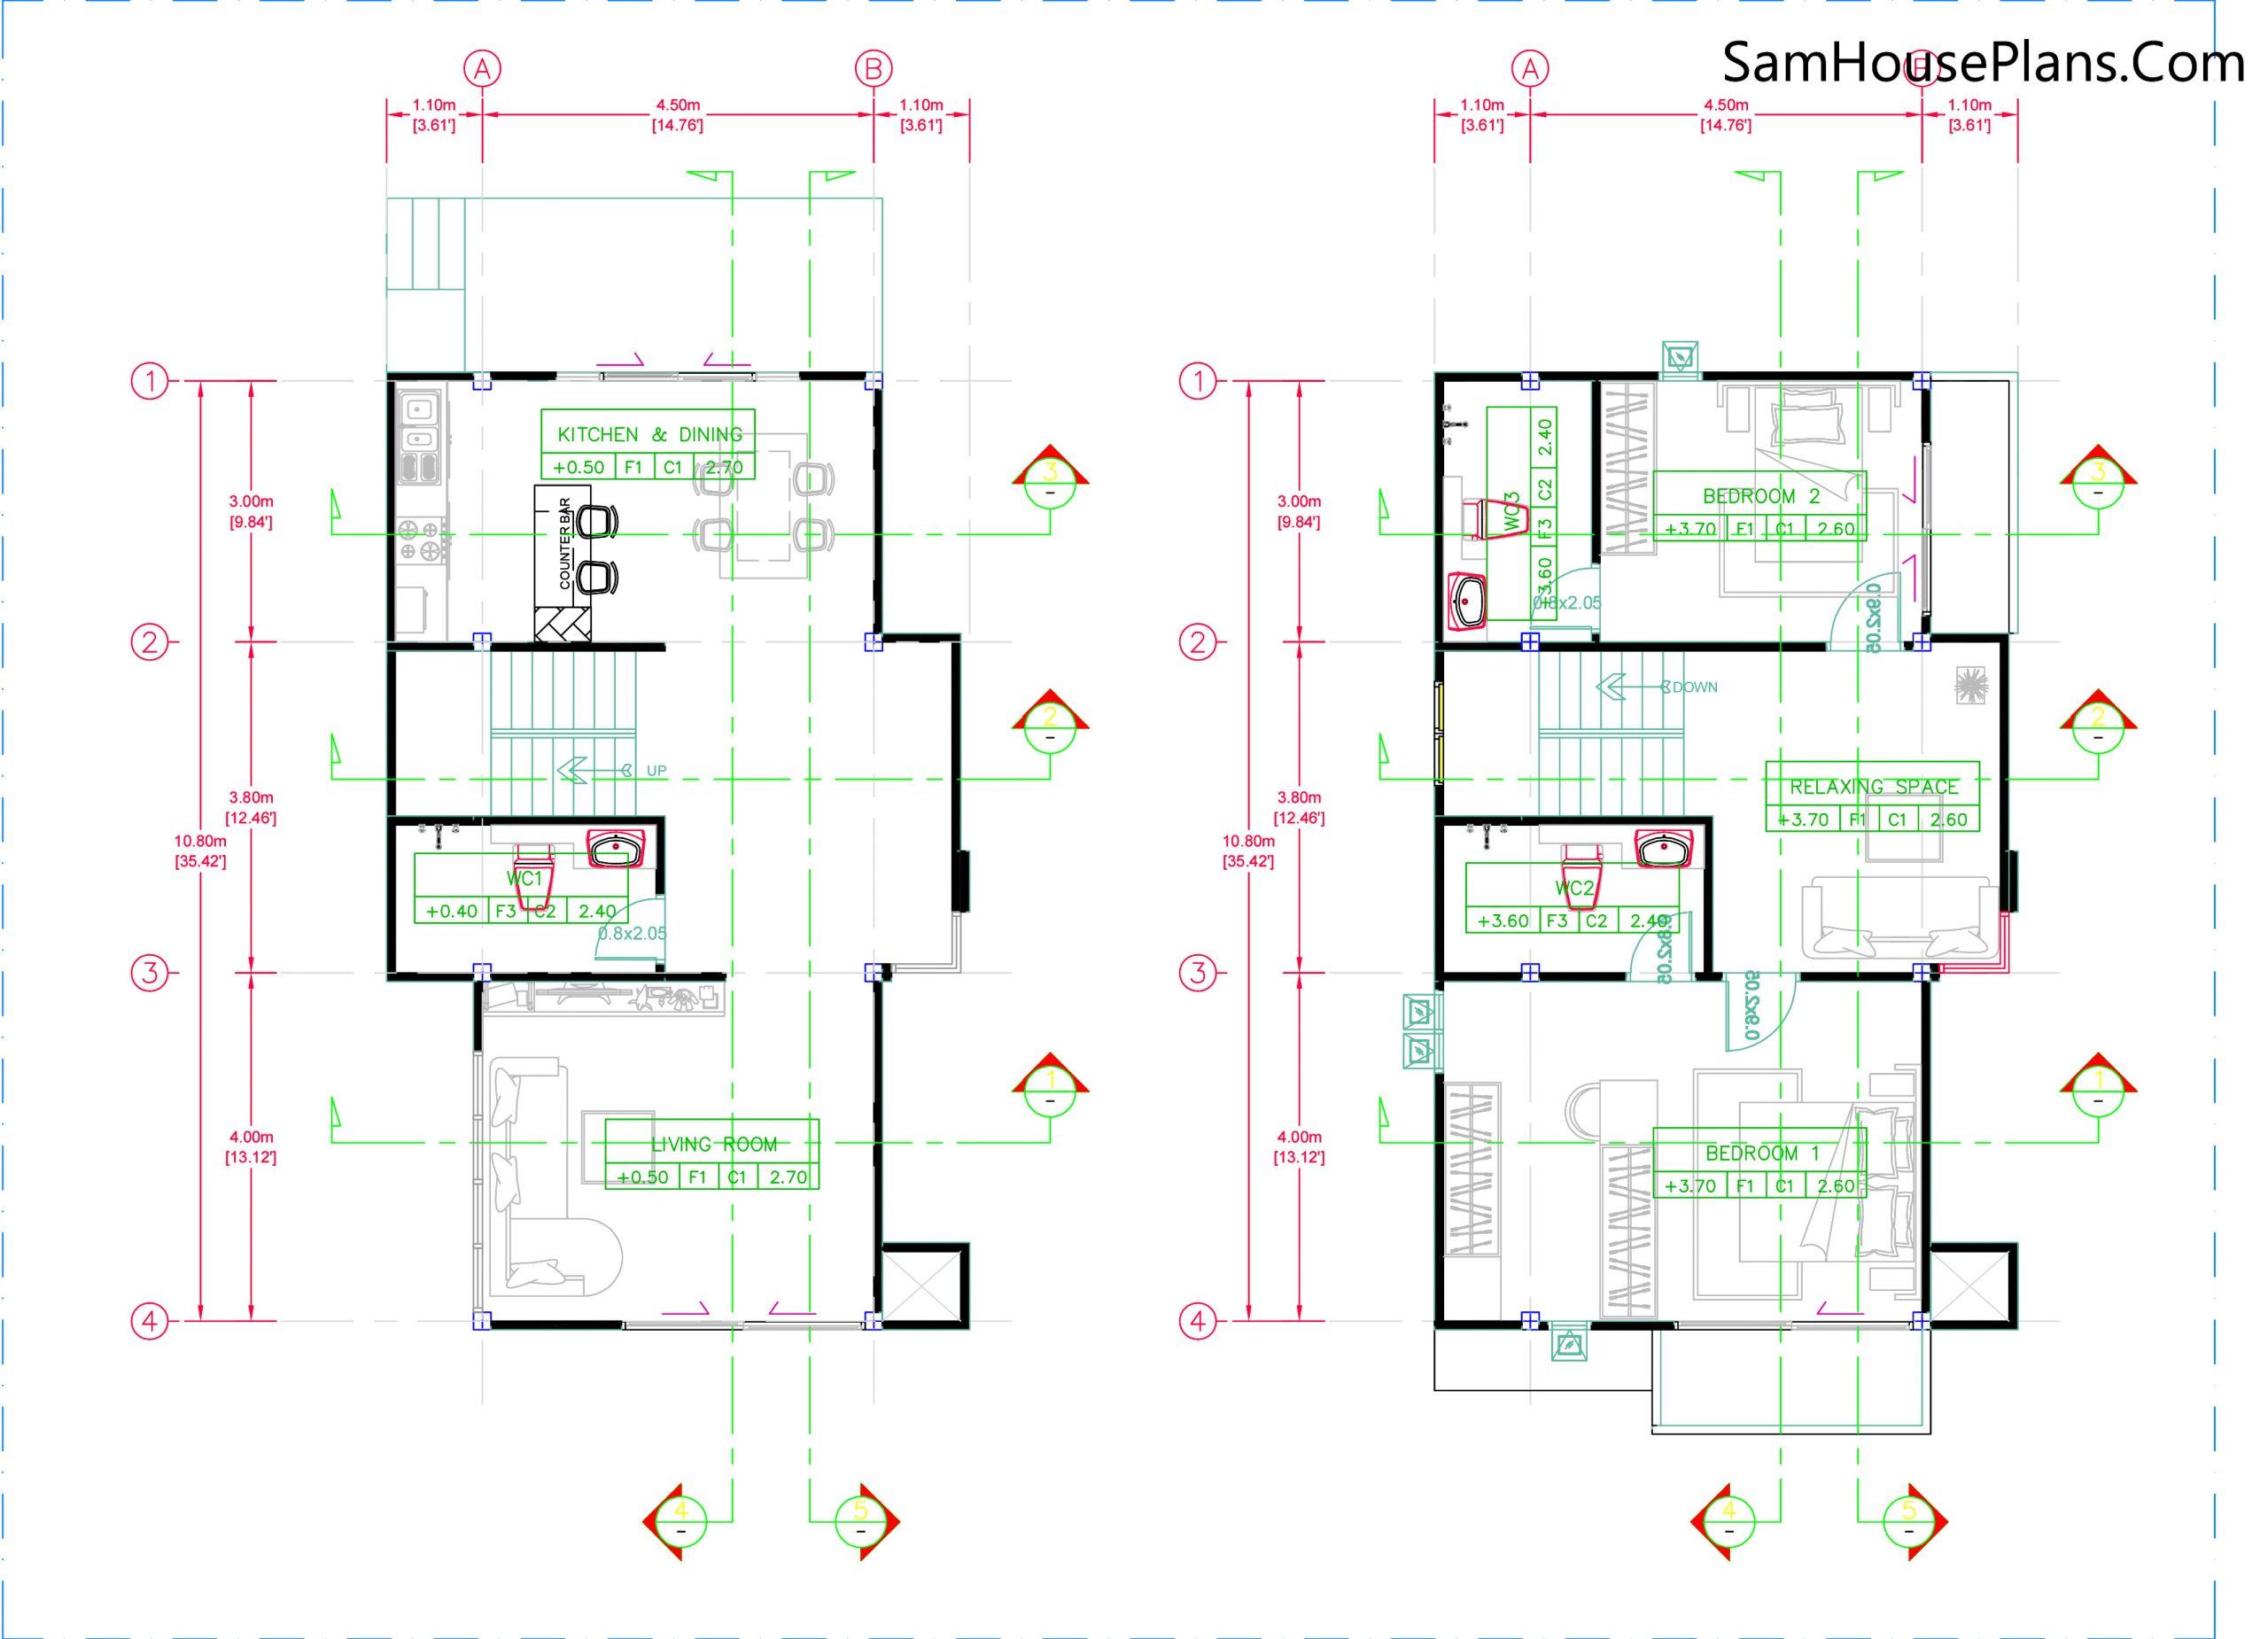 Small House Plan 6.7x10.8 layout plan